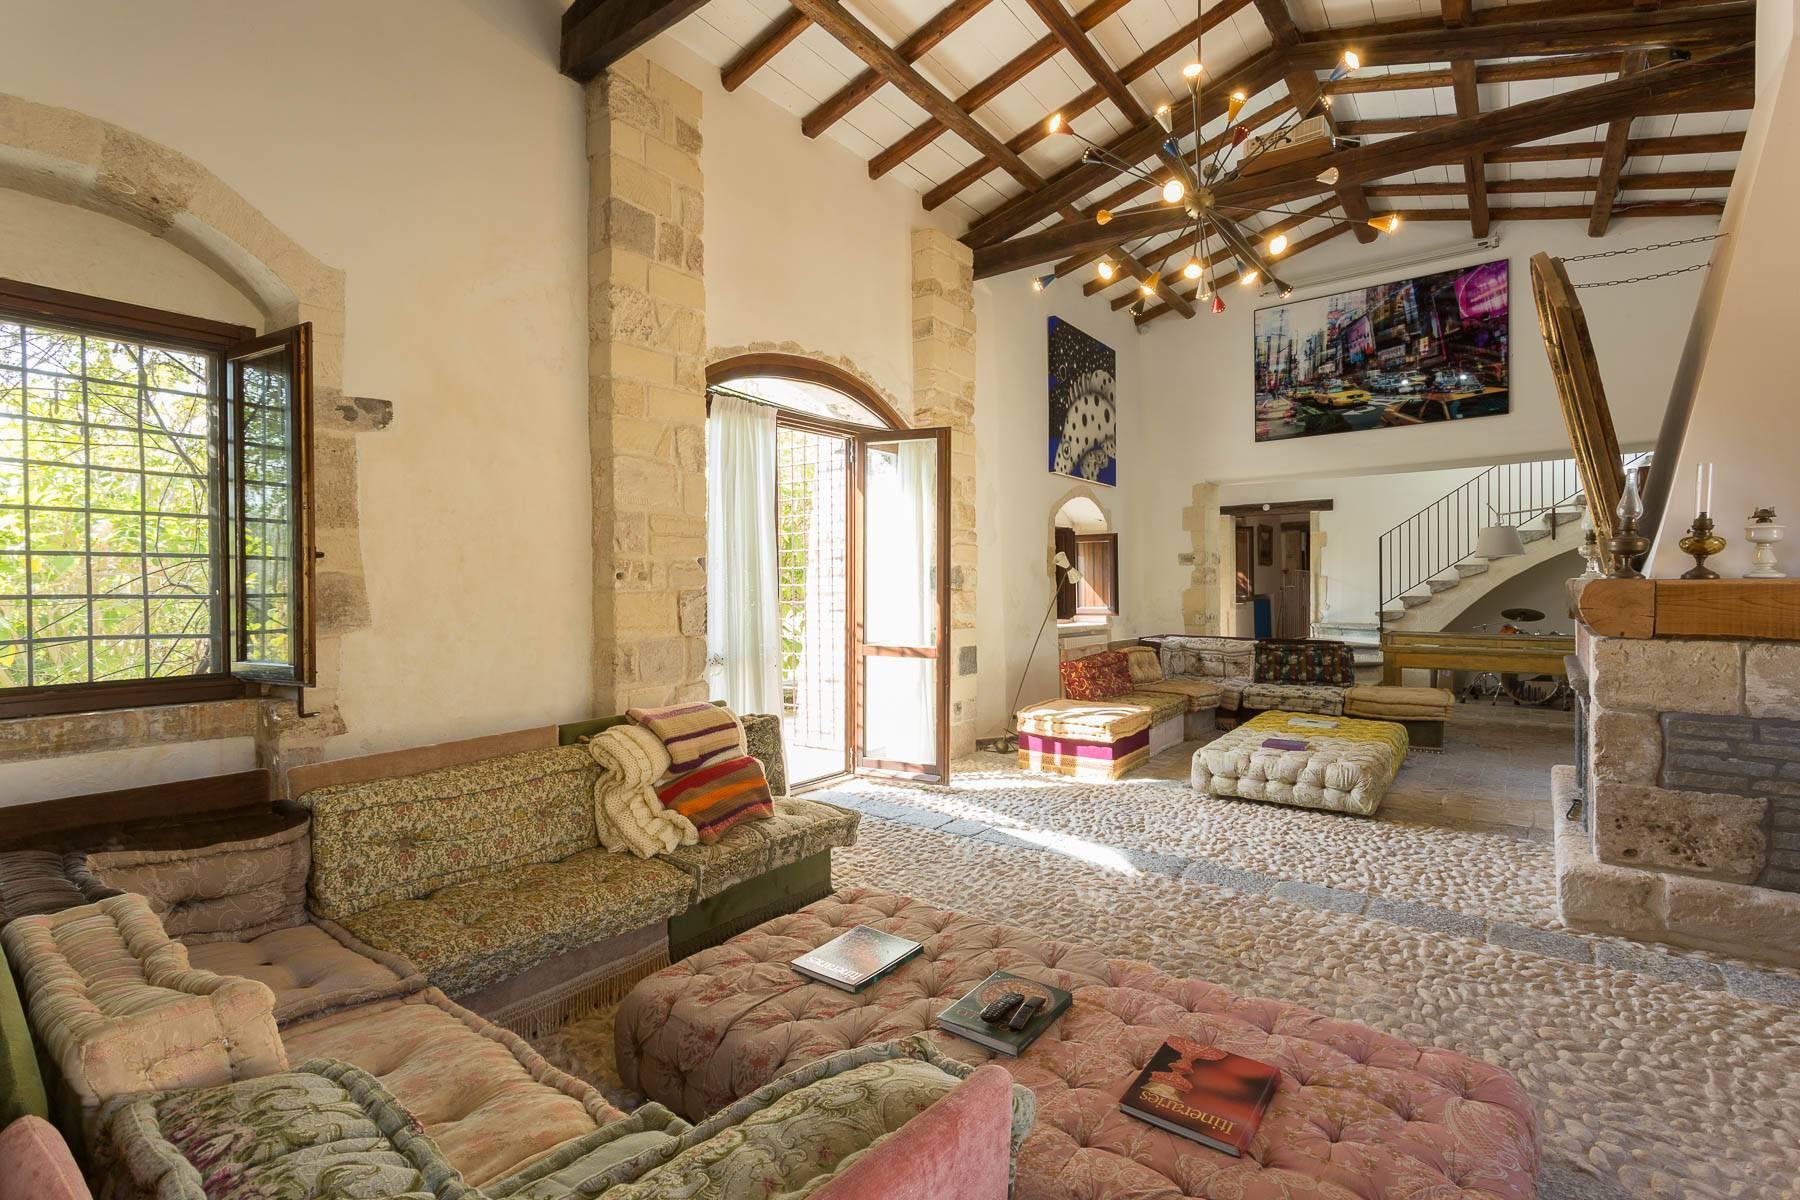 Authentic farmhouse with Sicilian flavor - 10